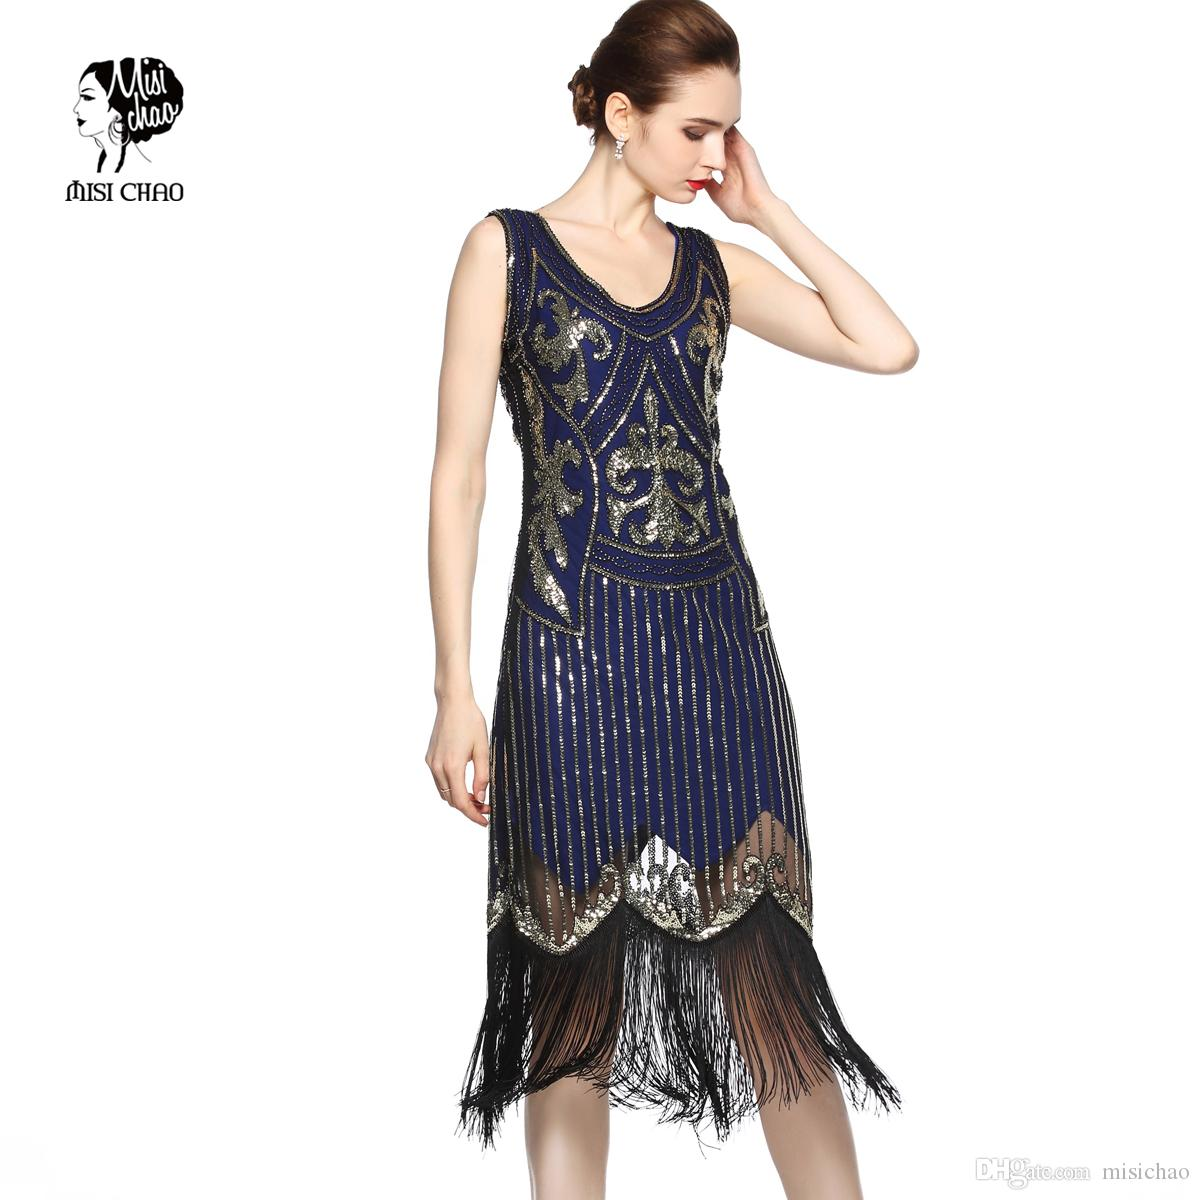 Fashion Sequins Tassel Dress Deep V Neck Party Dresses 1920s Flapper Gatsby  Vintage Evening Costume For Women Plus Size Holiday Party Dresses Short ...